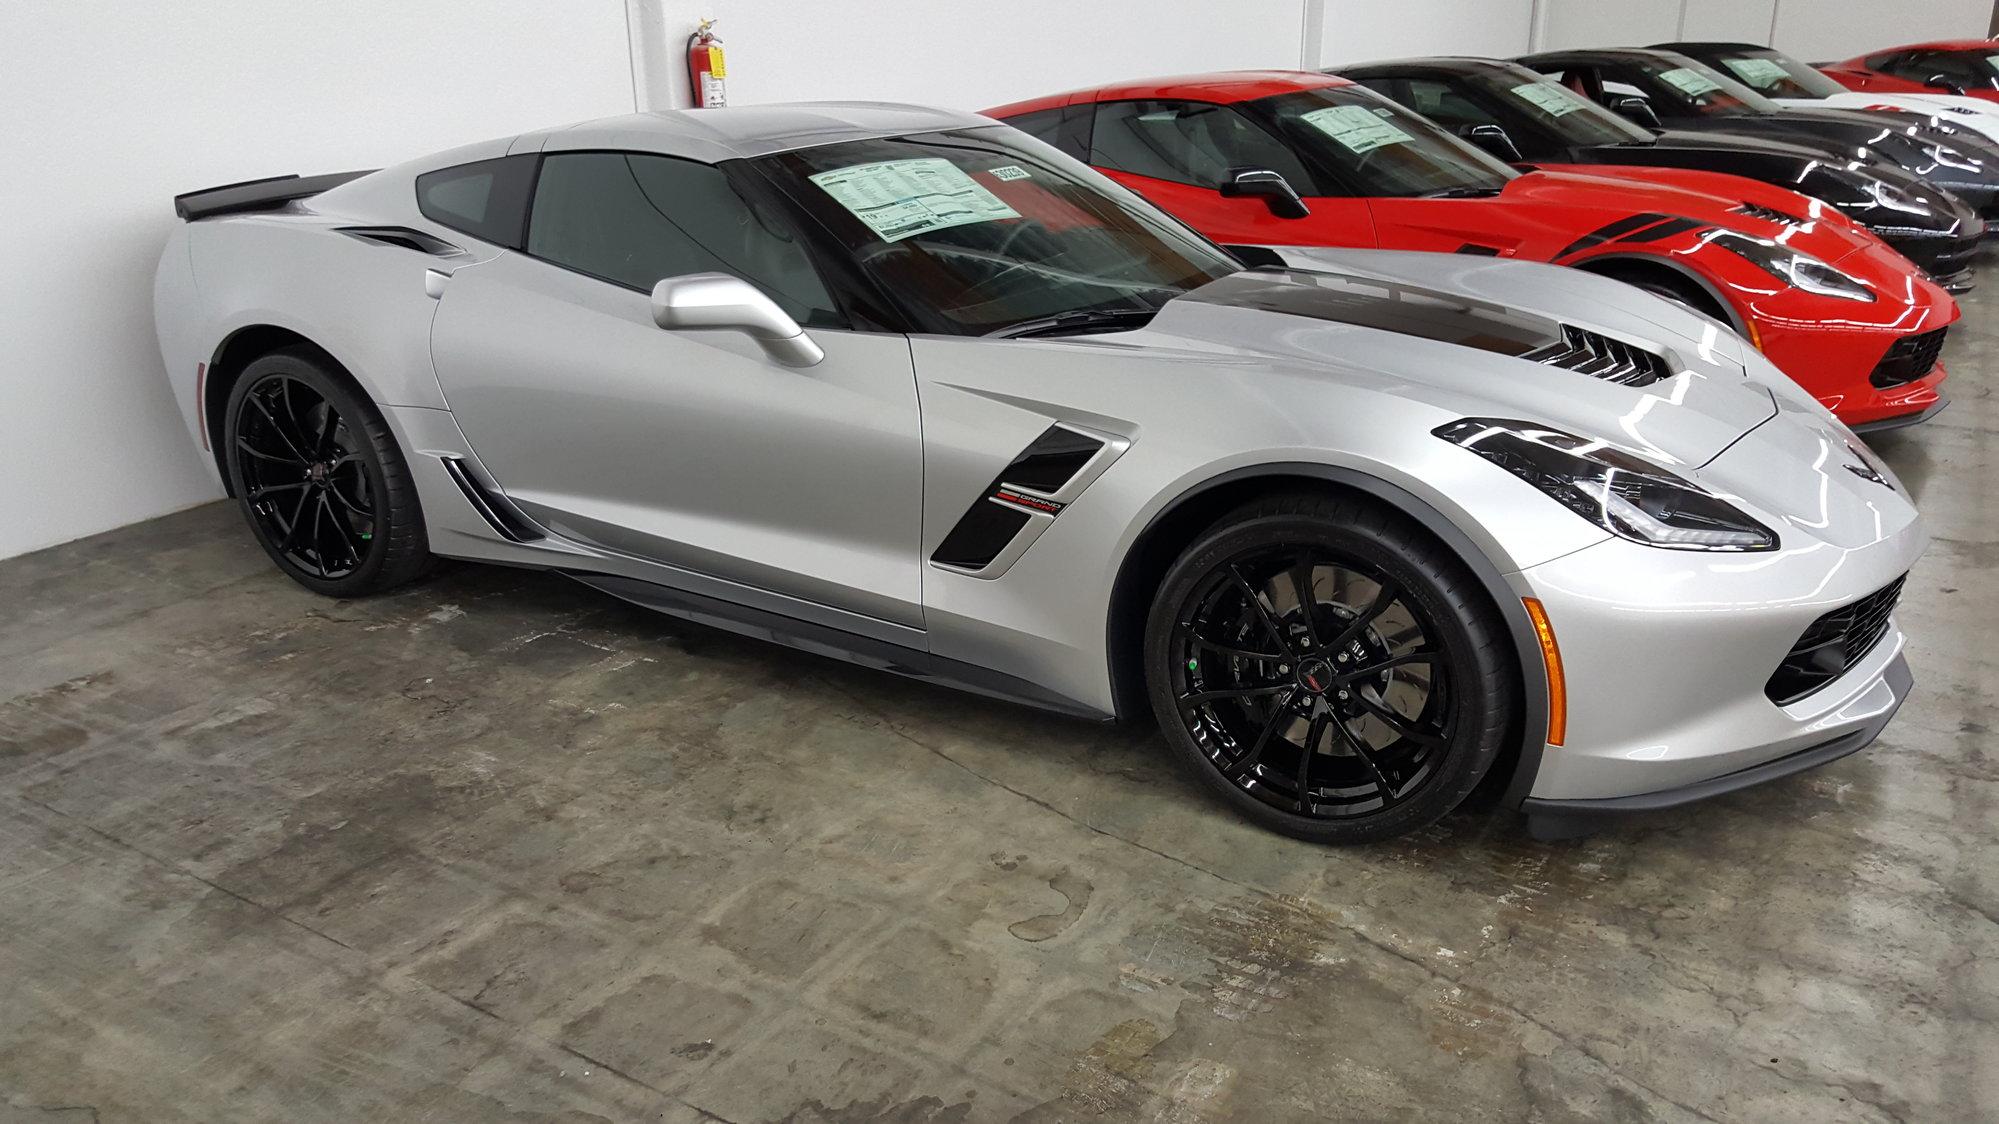 corvette 2017 colors - HD1999×1124